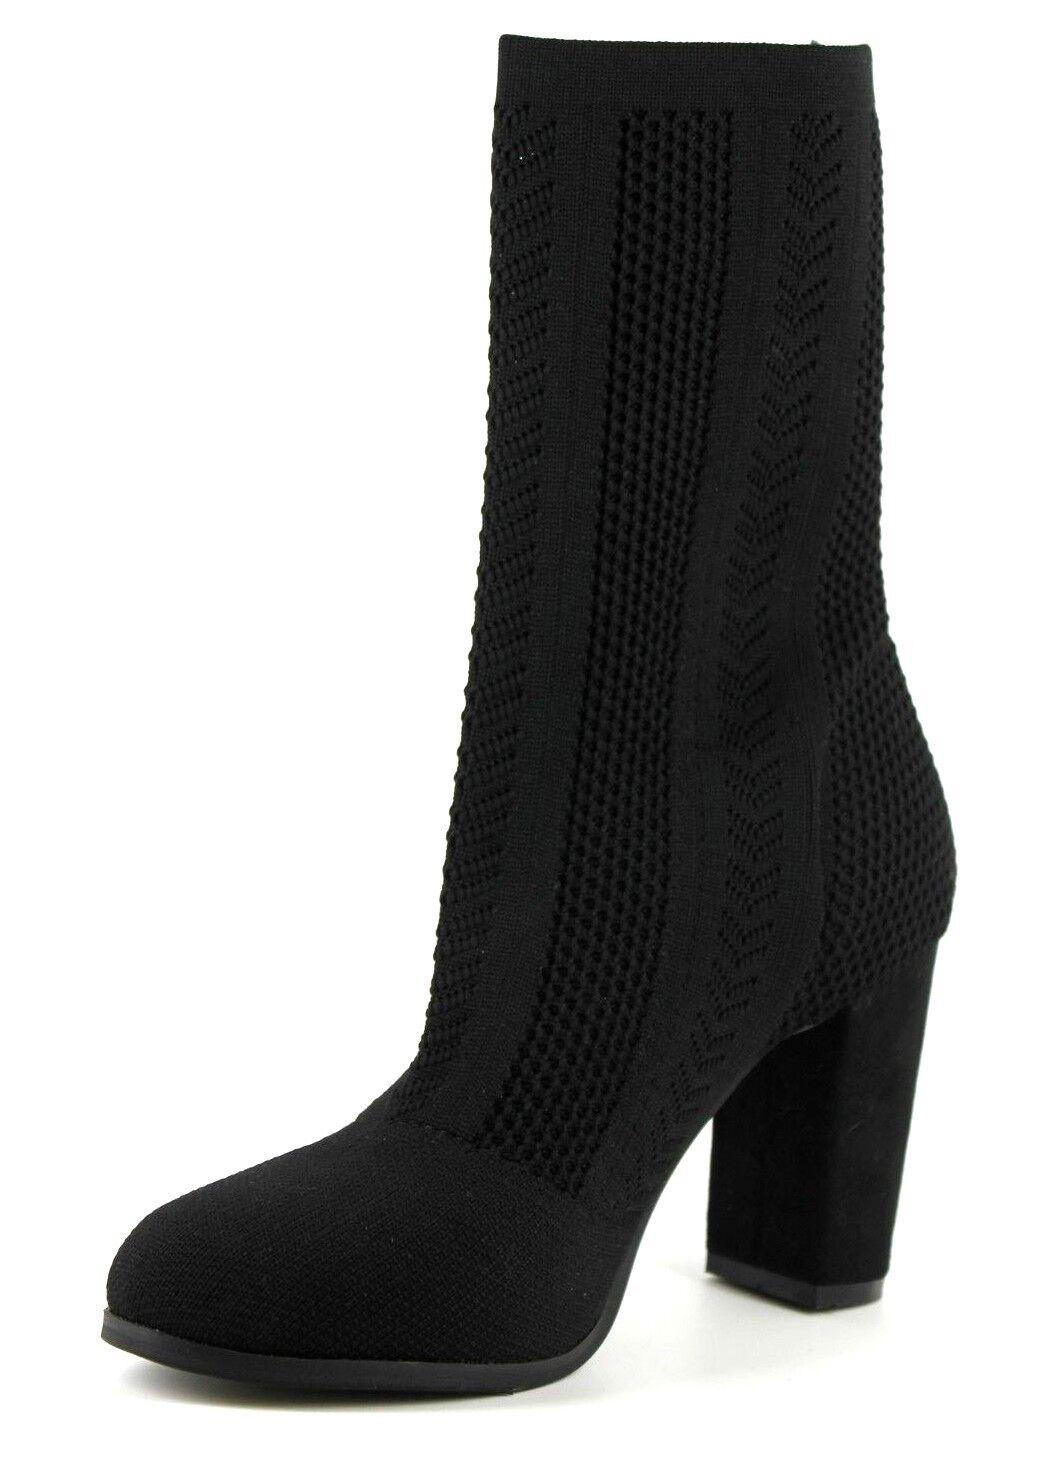 Wallis Wallis Wallis Artist Womens UK 5 EU 38 Black High Block Heel Textile Mid Calf Boots 0dd6e2